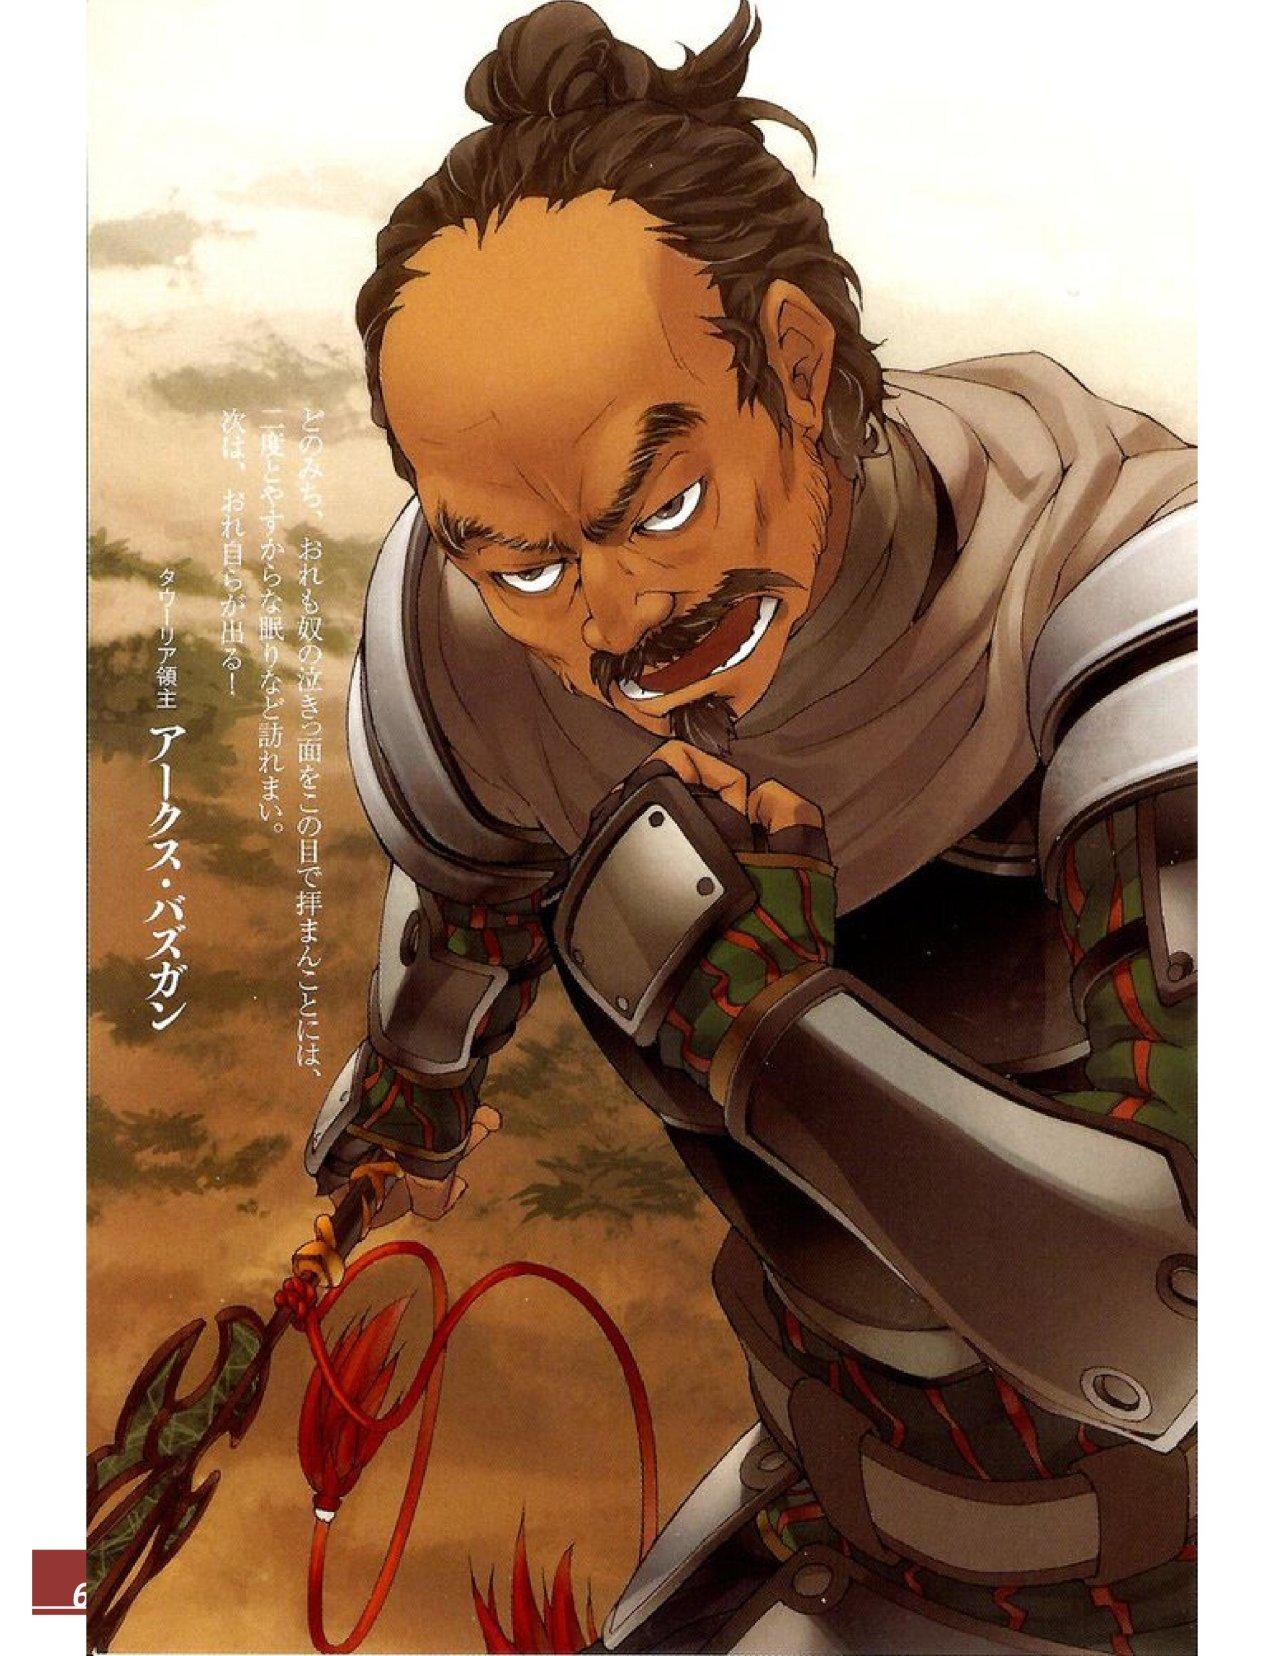 https://c9.mangatag.com/es_manga/pic5/22/25558/727844/9c04e24ccde45a5419fabc2e918e750c.jpg Page 6